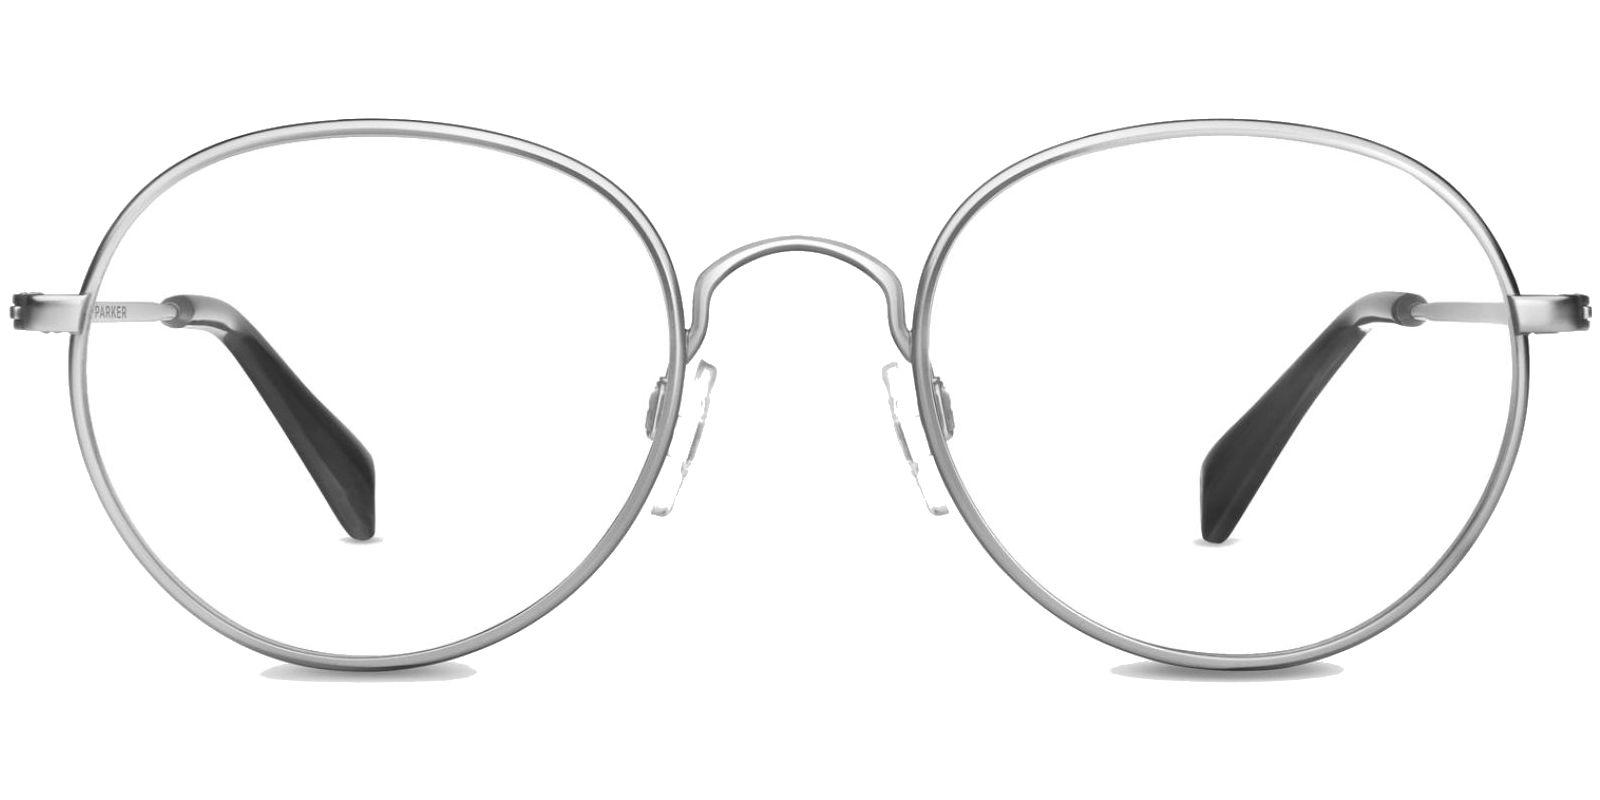 70s inspired metal frames - Wire Framed Glasses